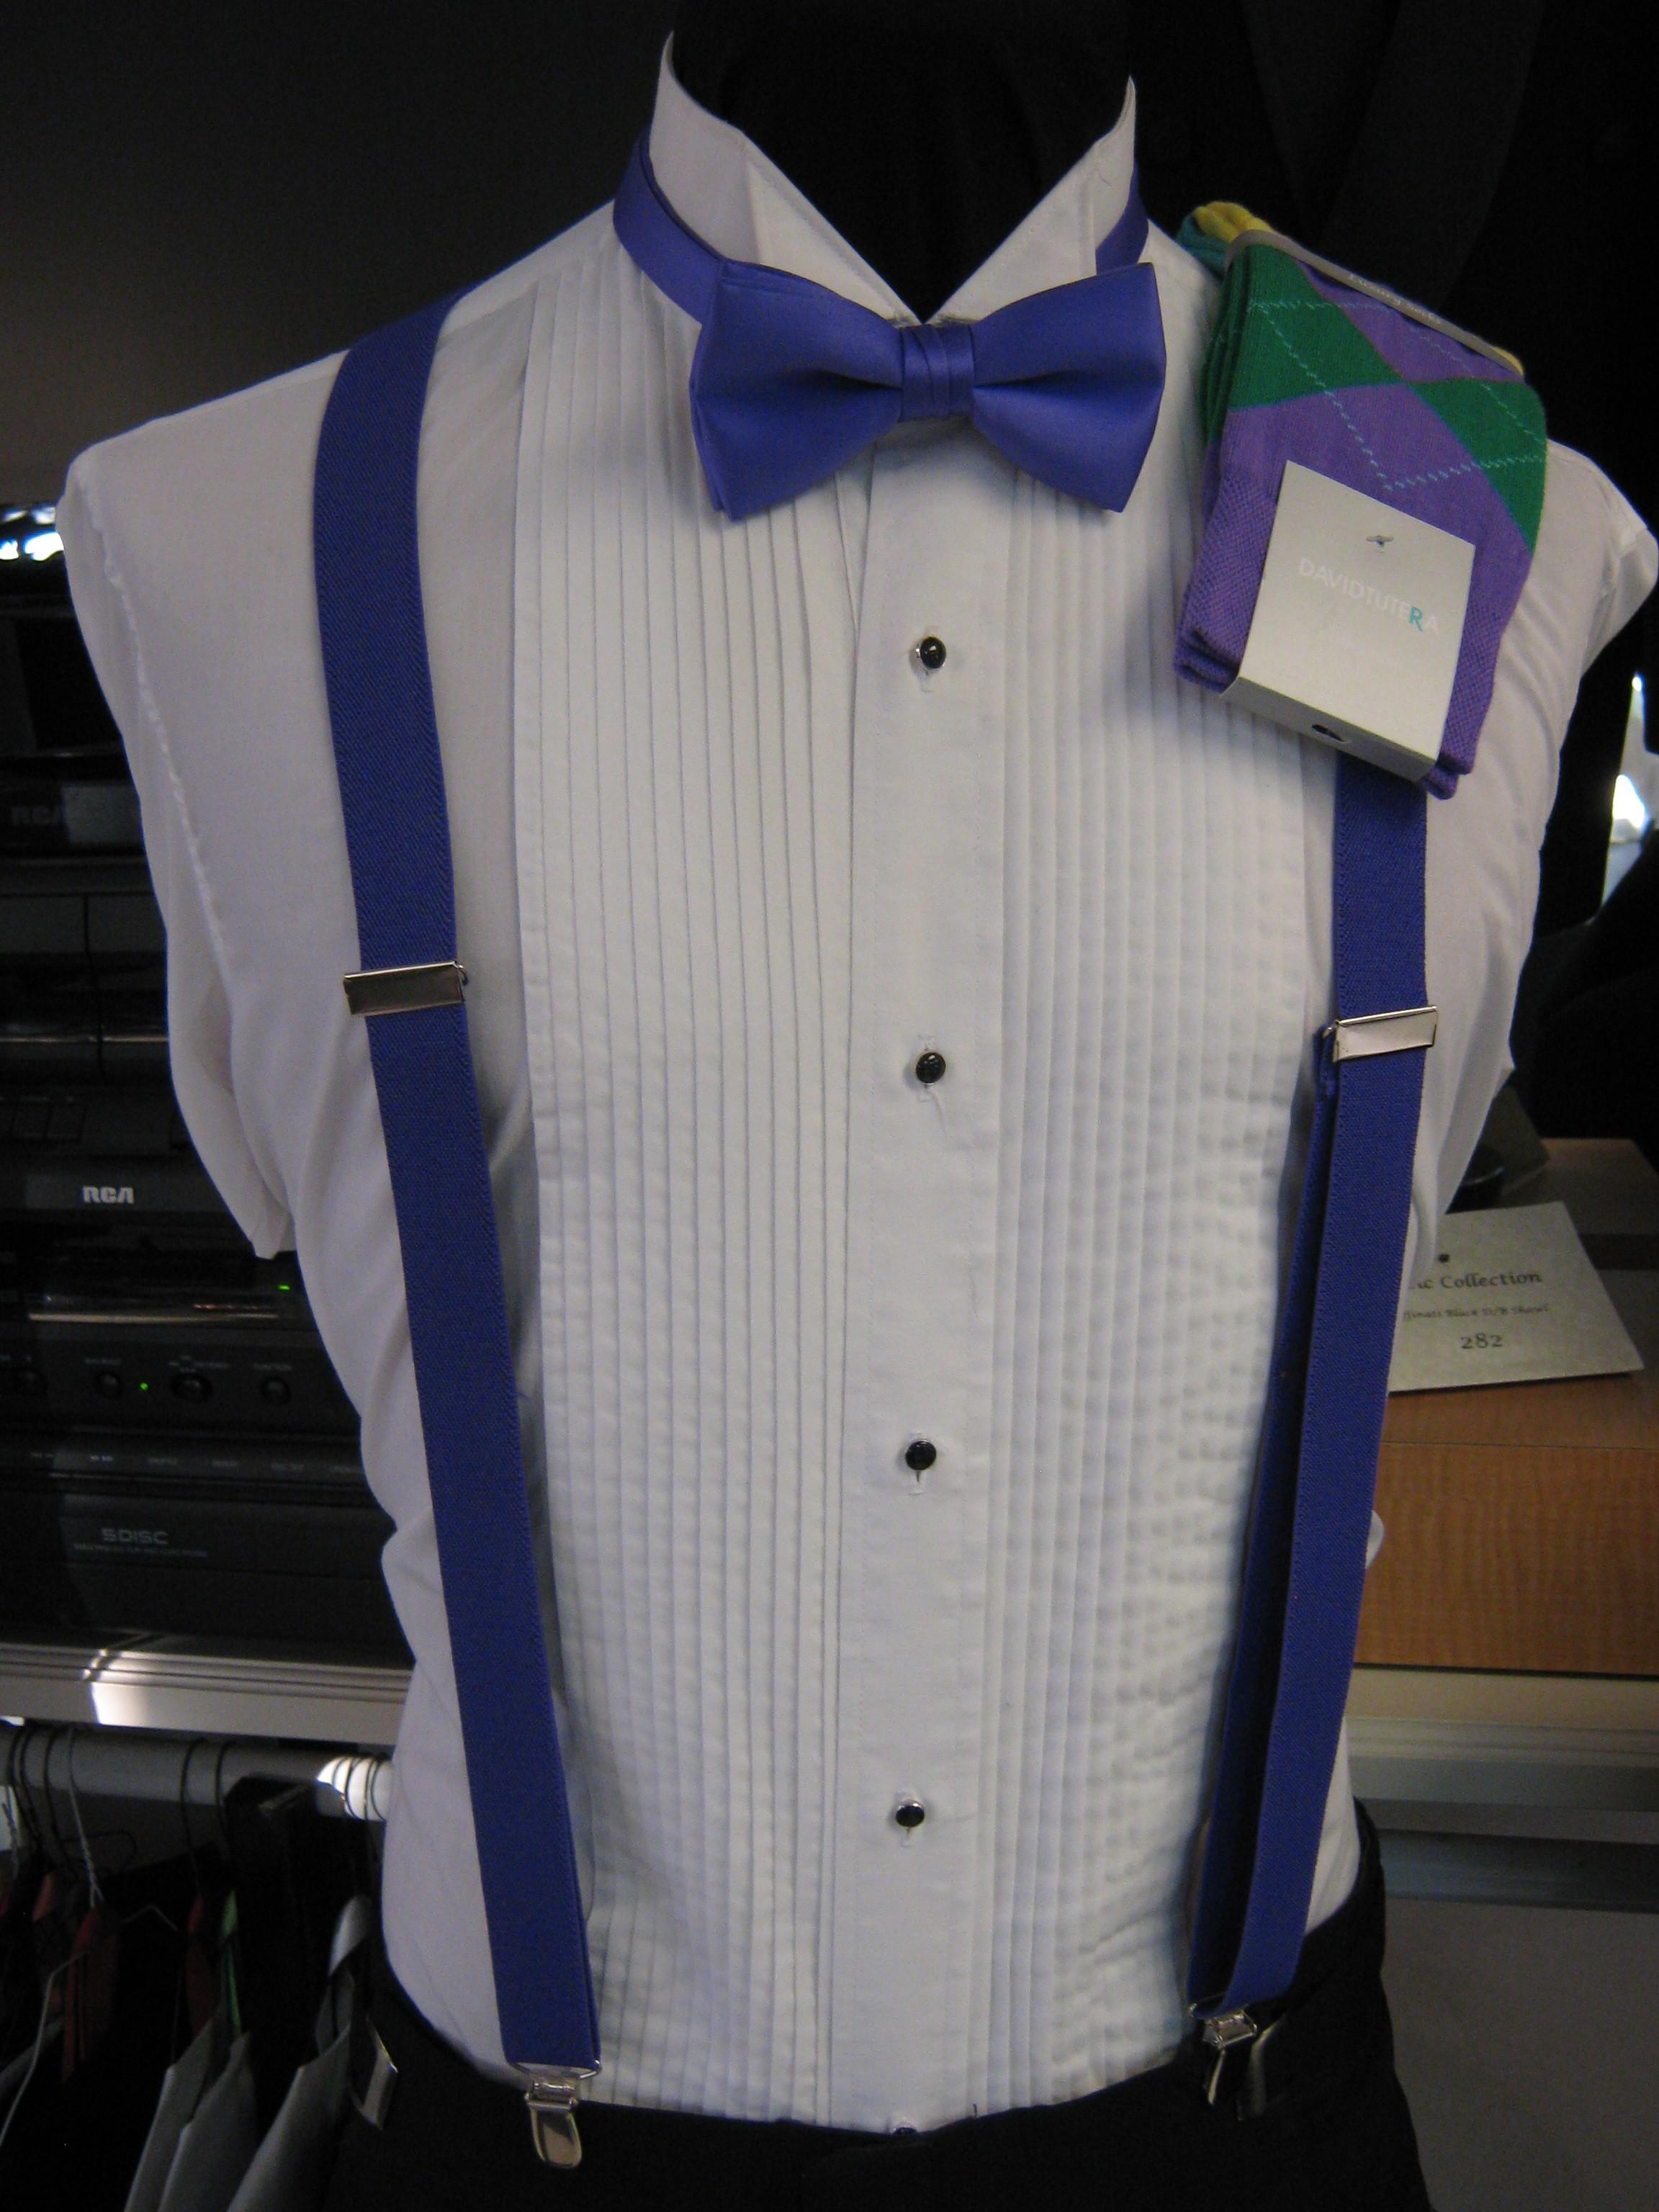 Quinceanera tuxedos for chambelanes - Rose Tuxedo: Tuxedo ...  Quinceanera tux...